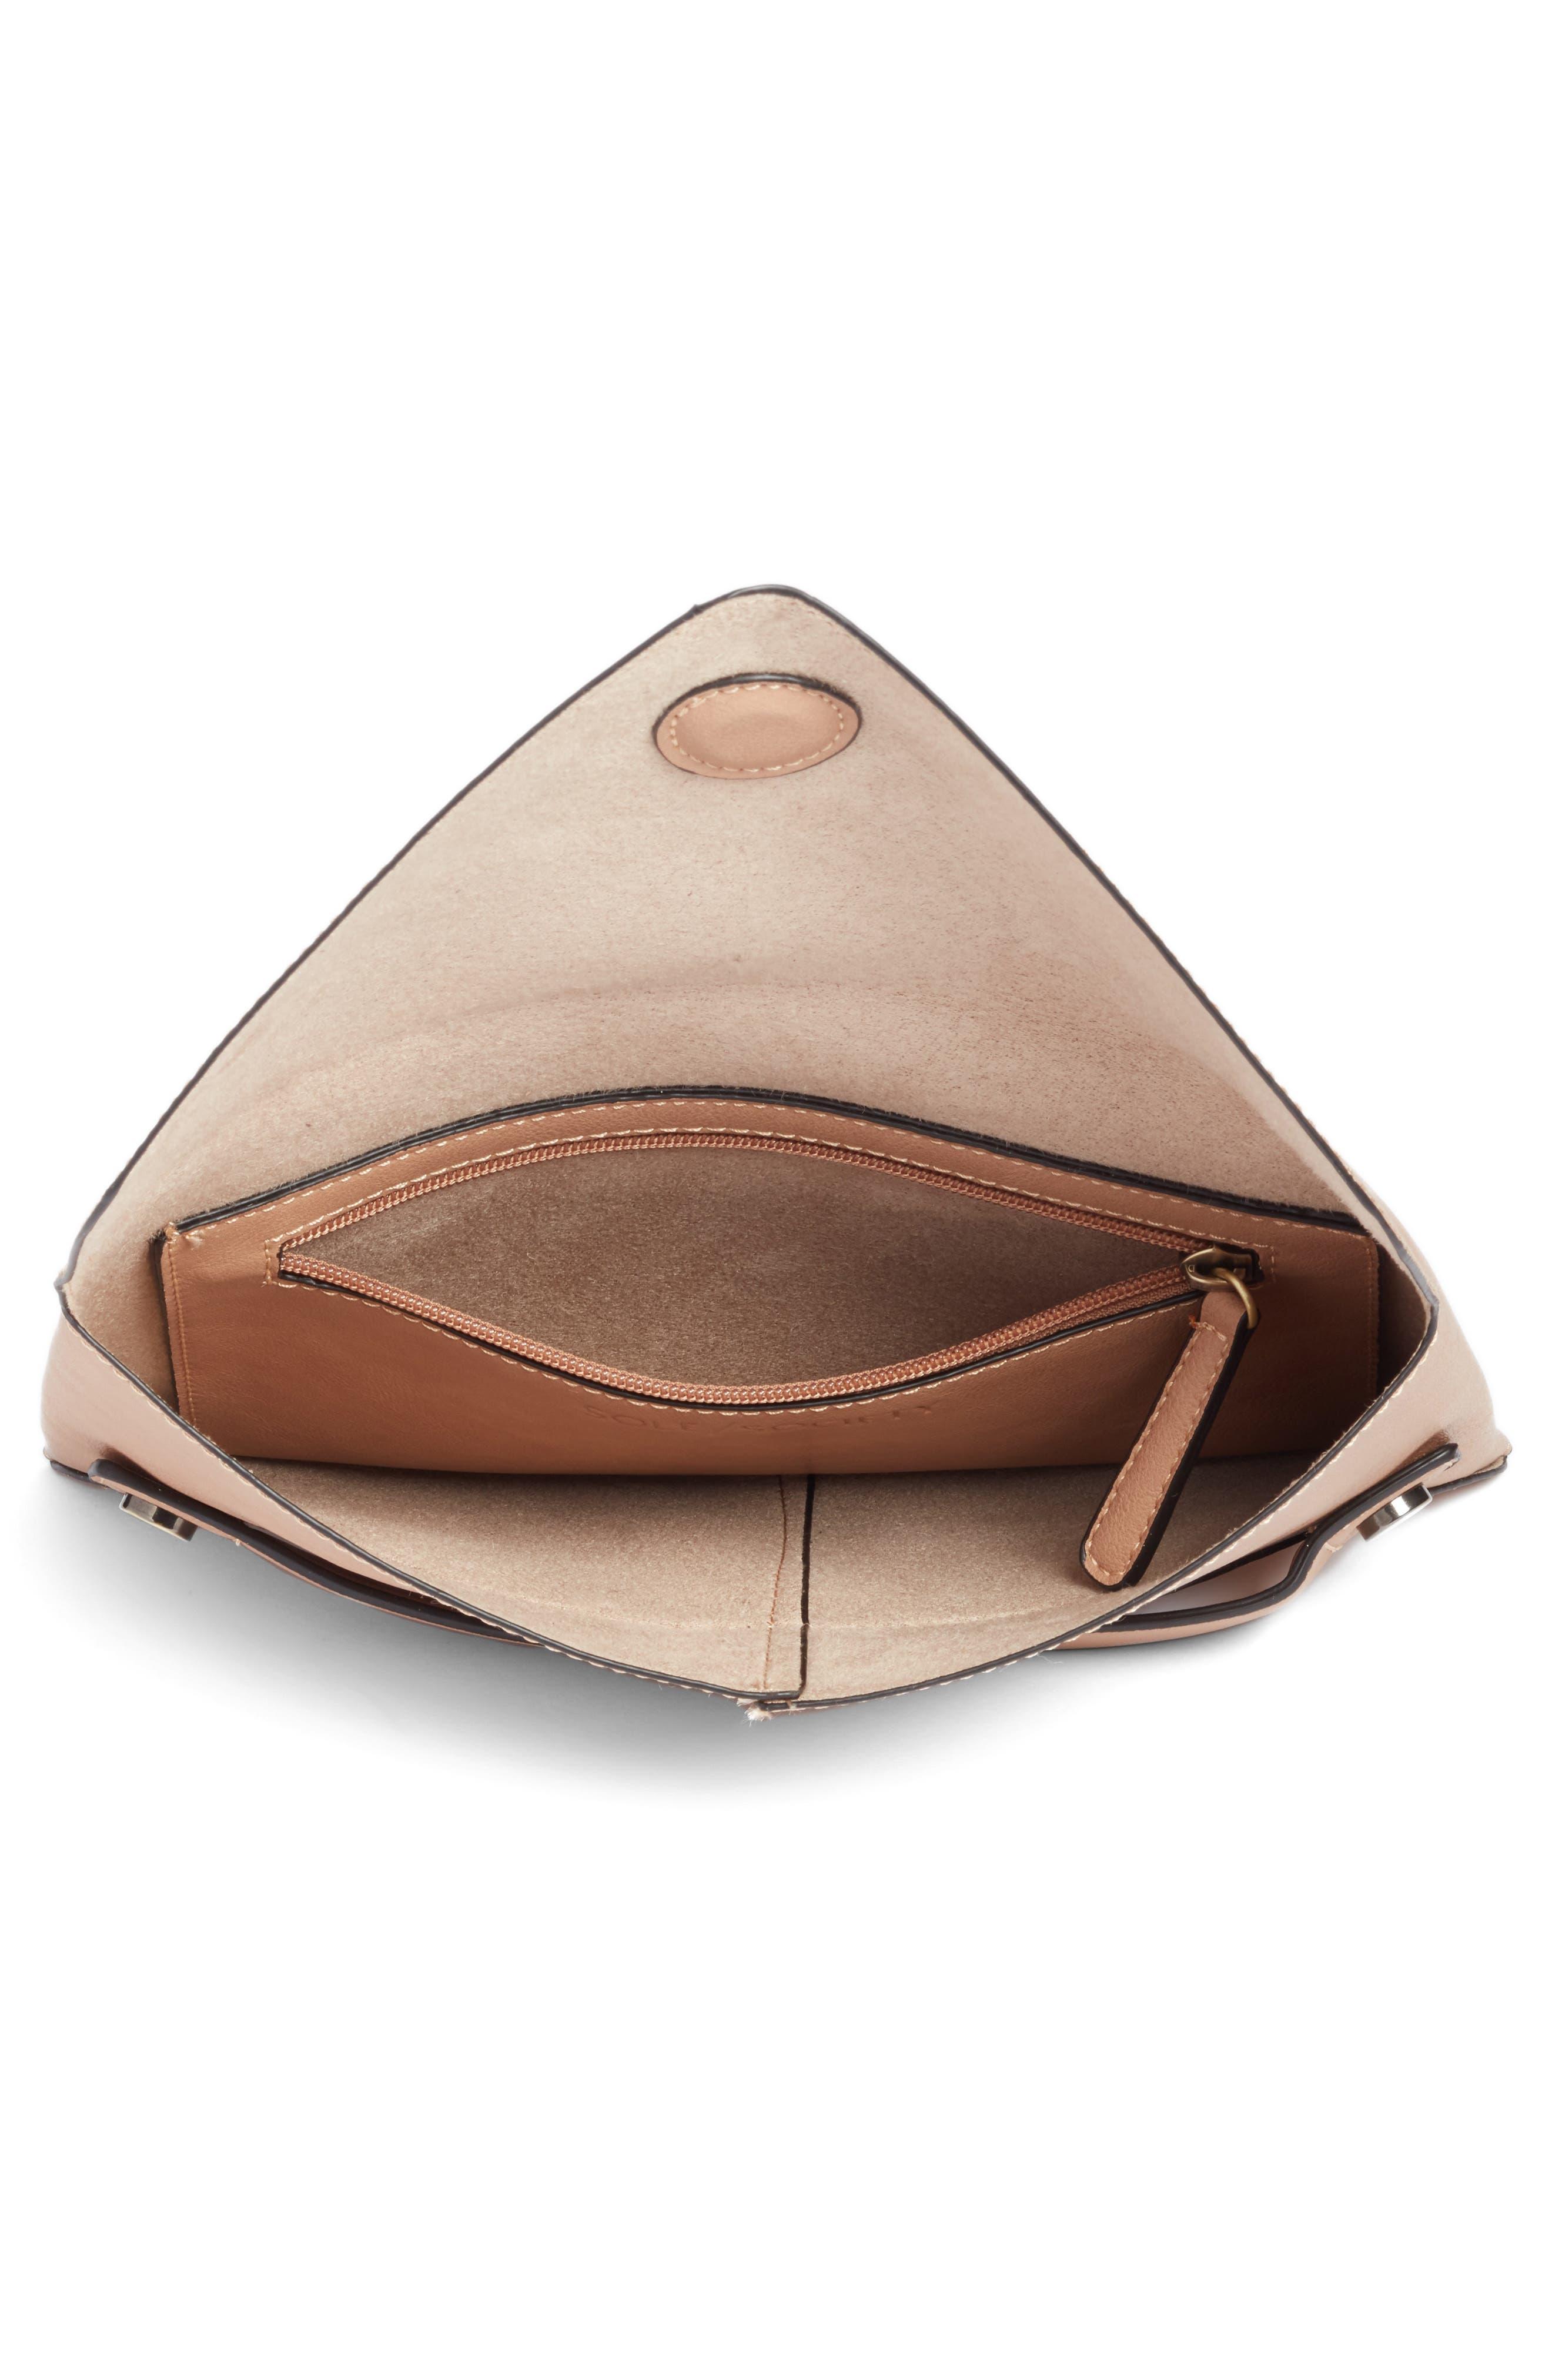 Alternate Image 4  - Sole Society Karen Faux Leather Envelope Clutch